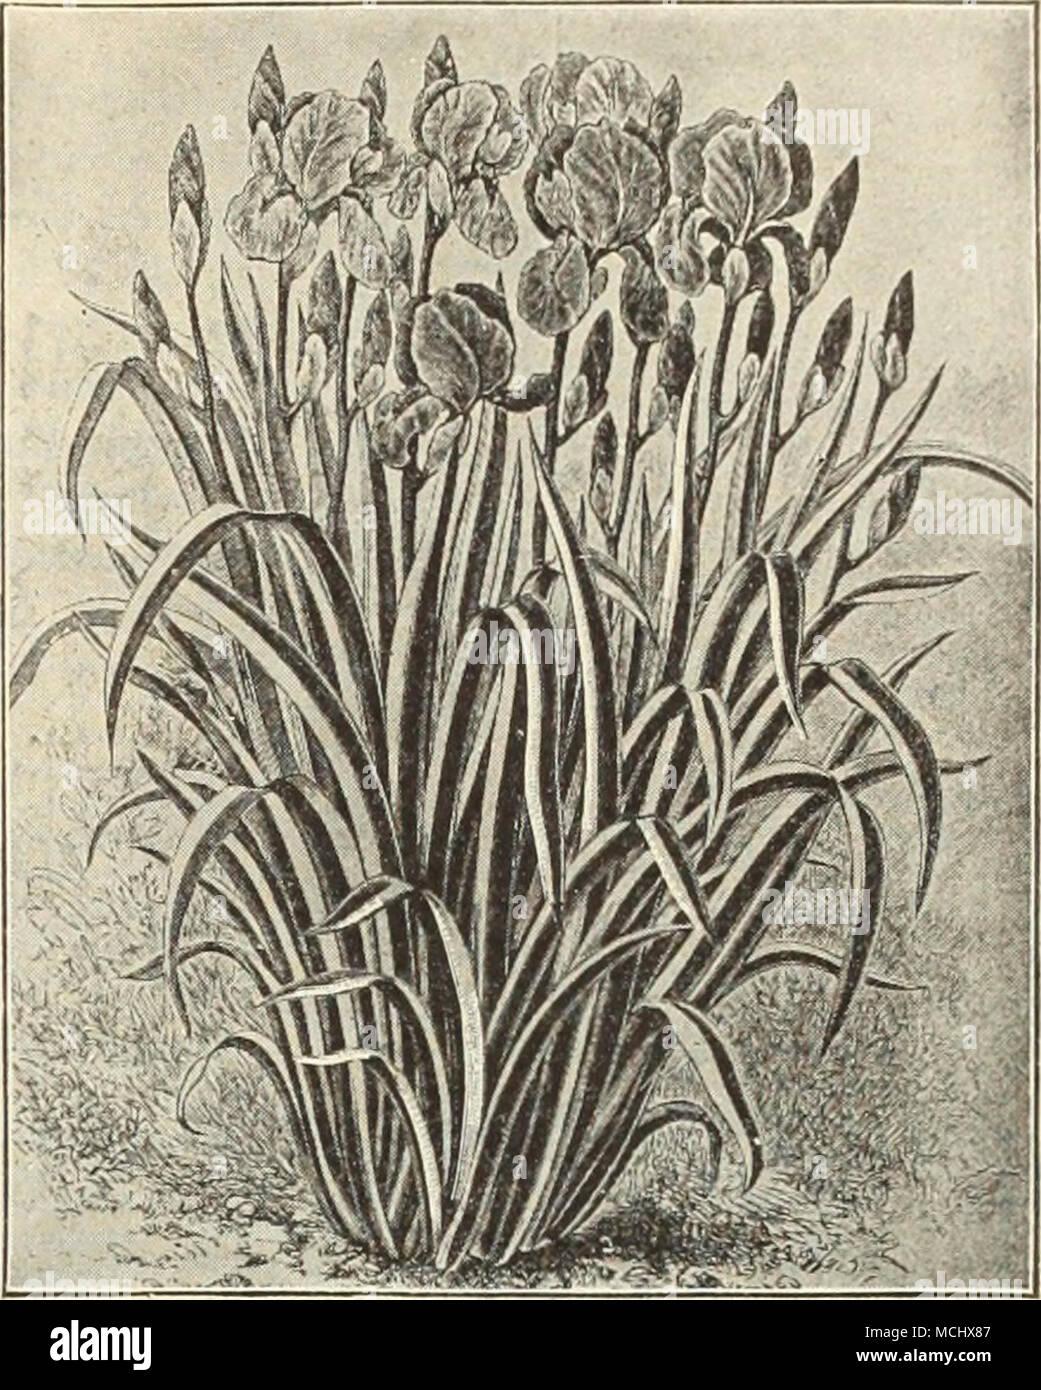 Fragrant spikes of deep purple flowers stock photos fragrant lilium speciobum rubrum llatris iris pallida folia varifgata lava3jditla izmirmasajfo